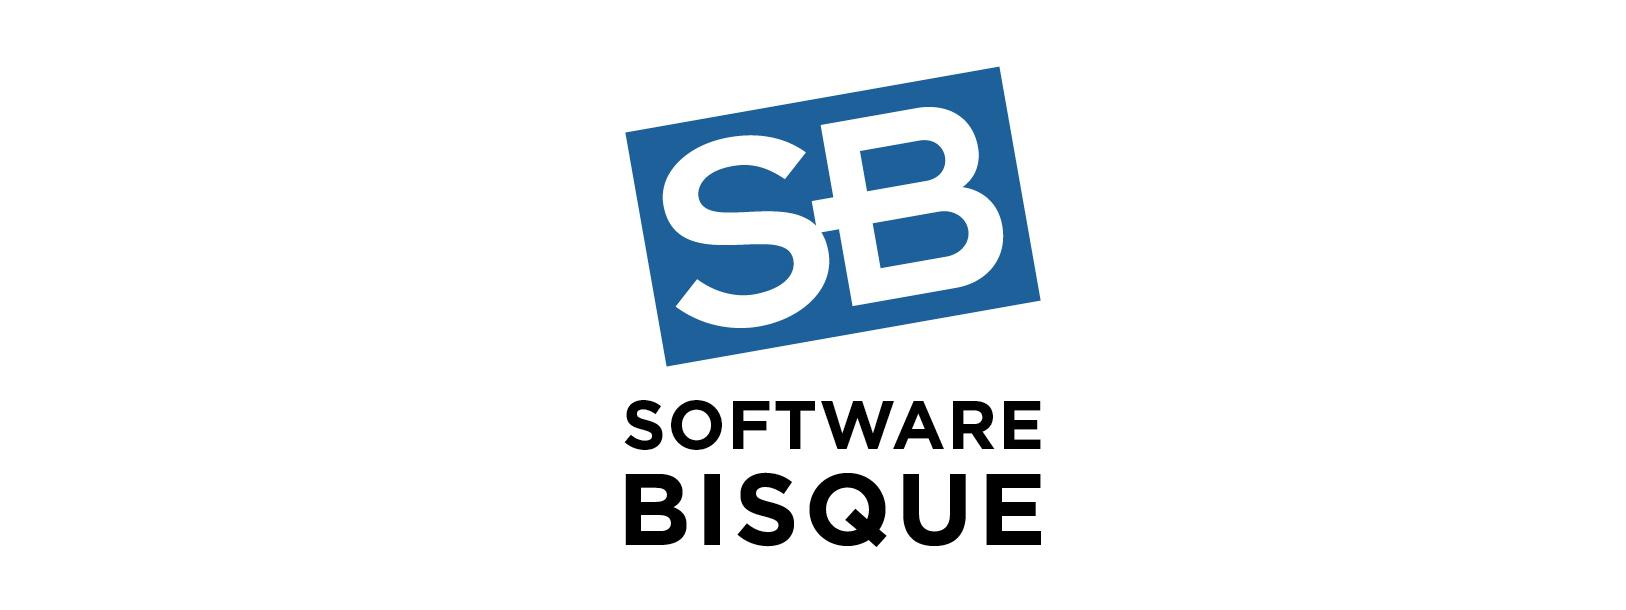 Software Bisqse